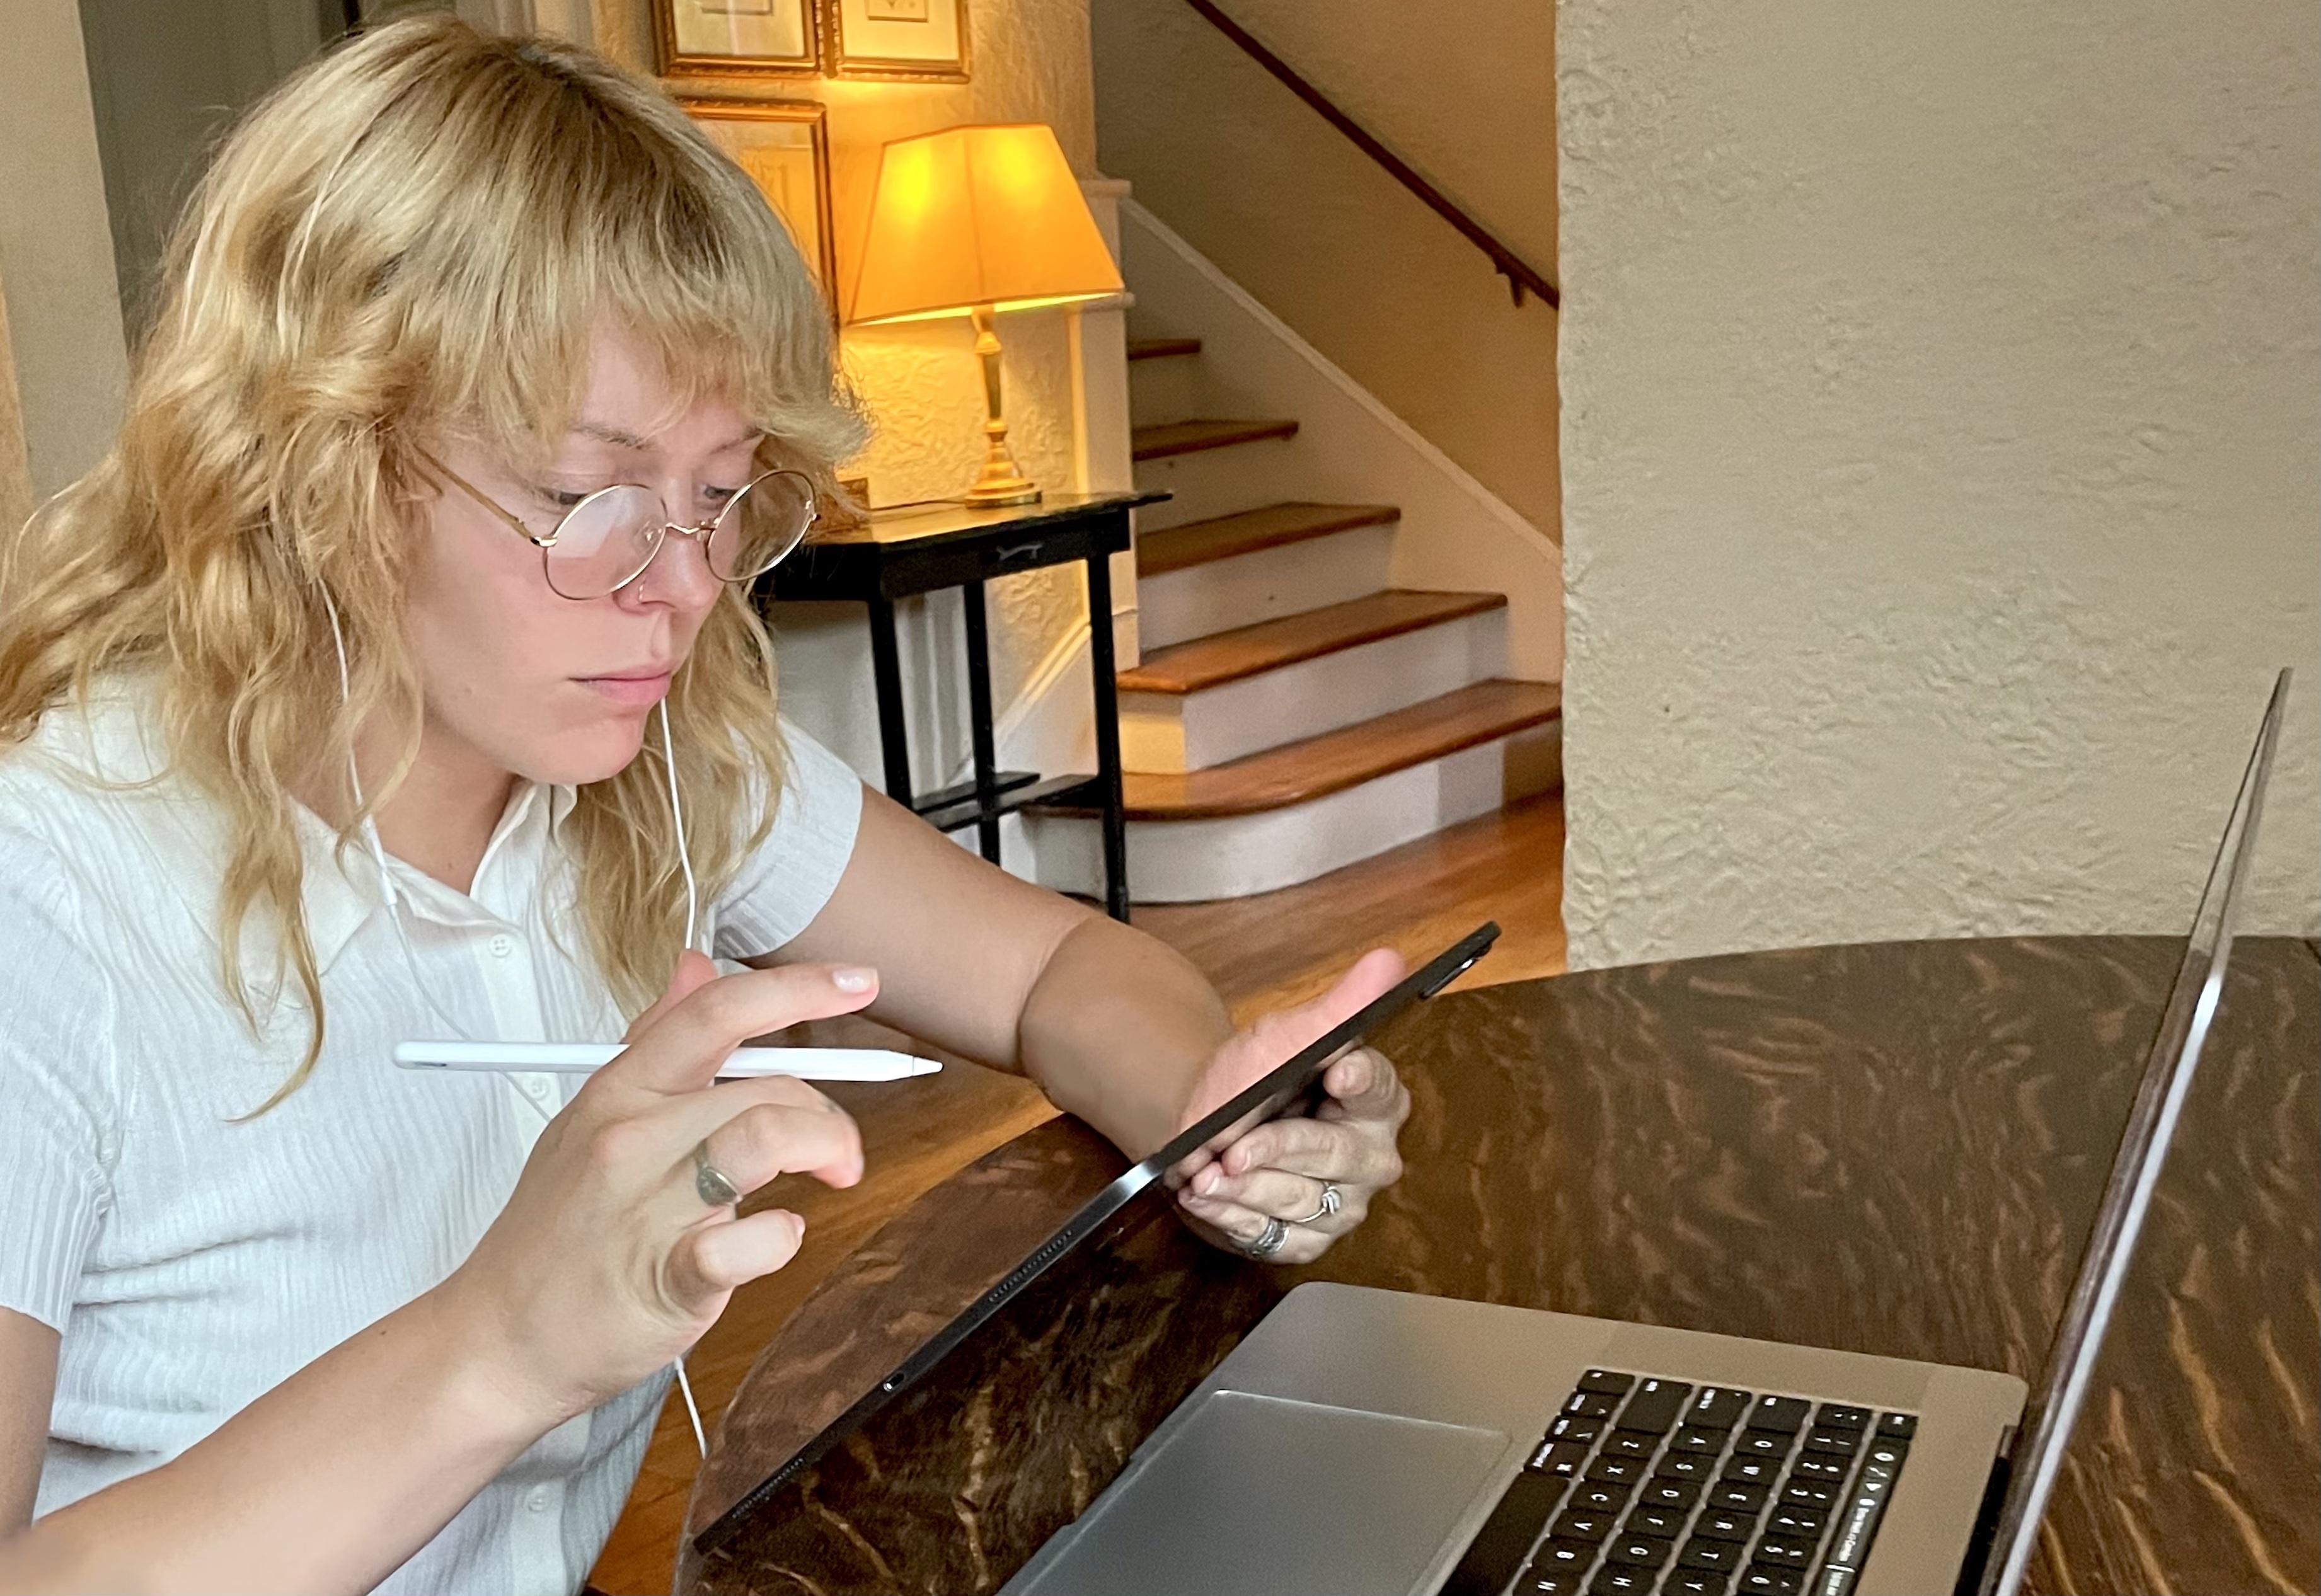 A student receiving online tutoring